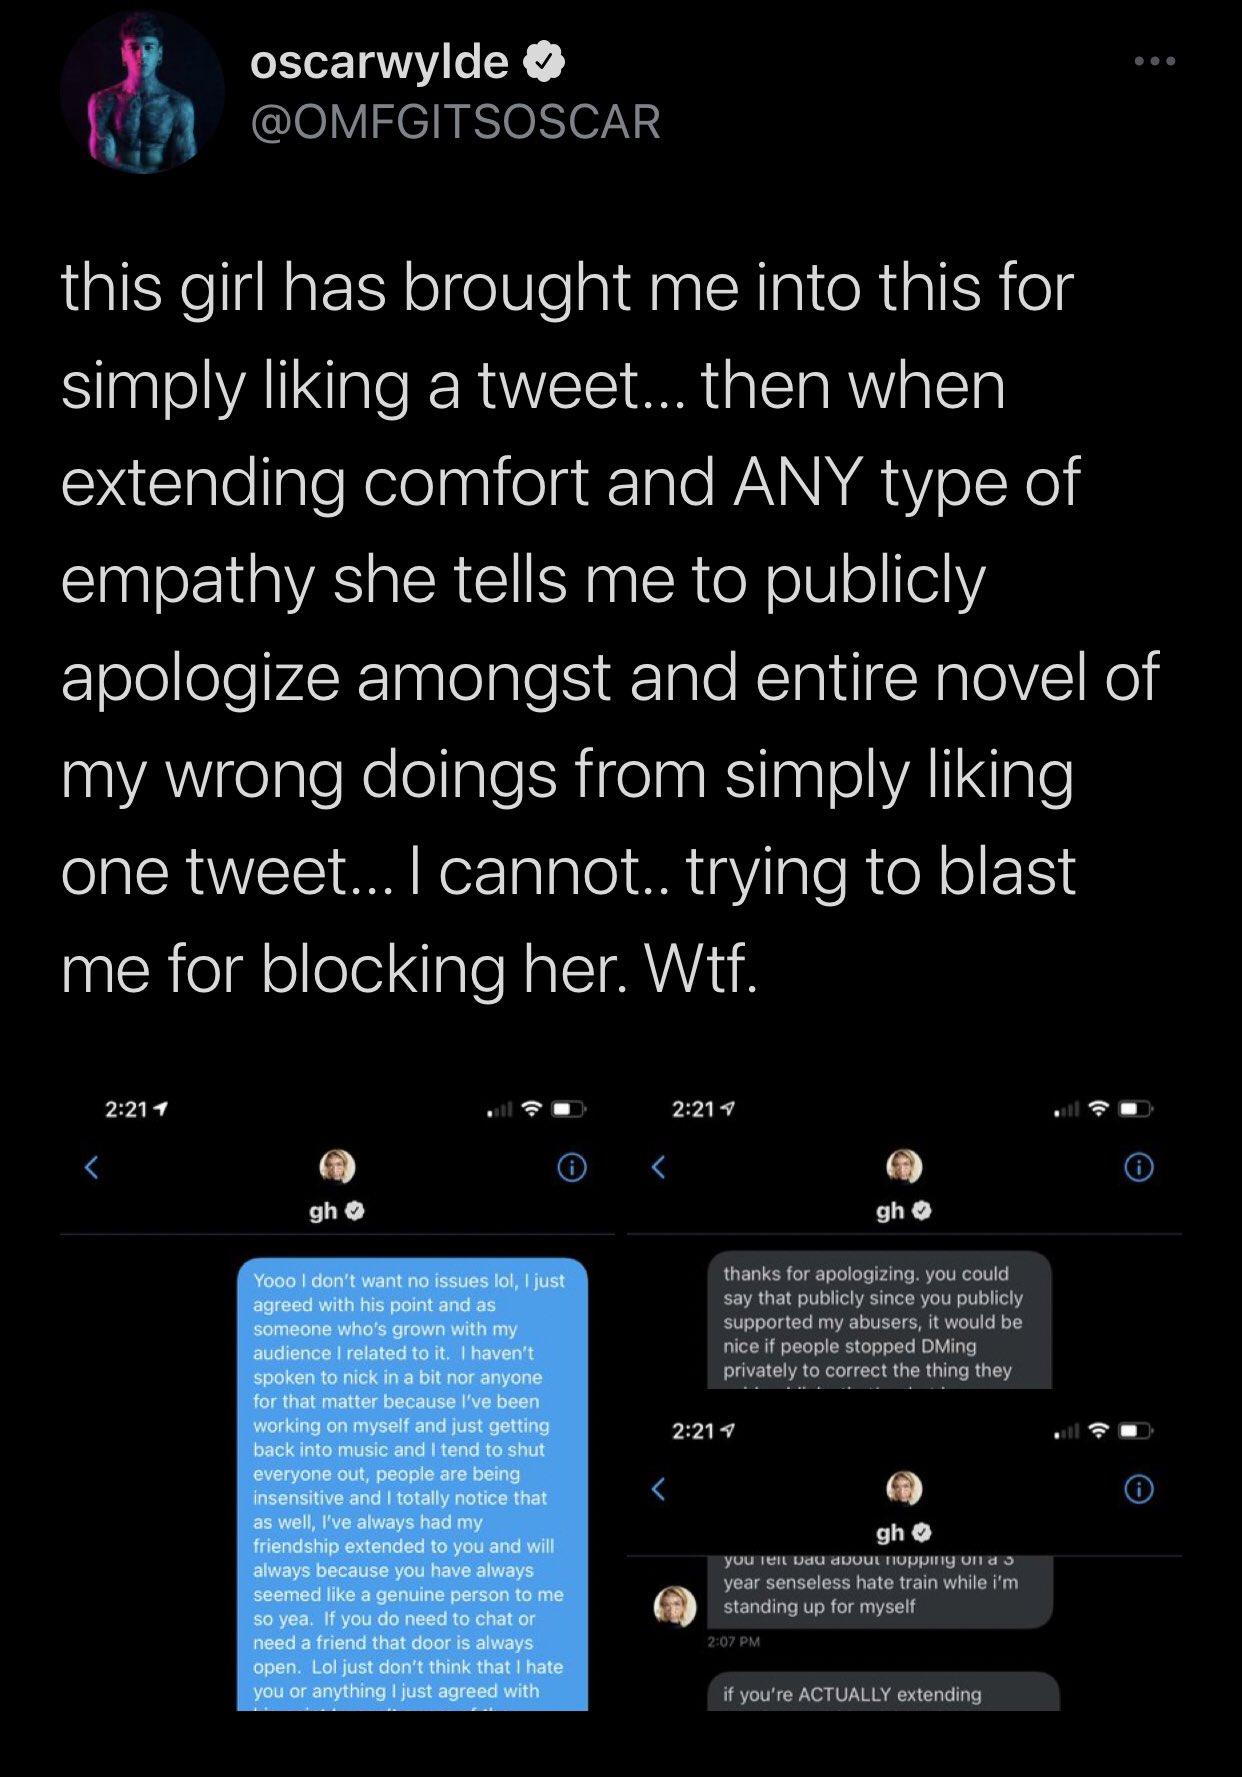 Oscar Wylde defends himself